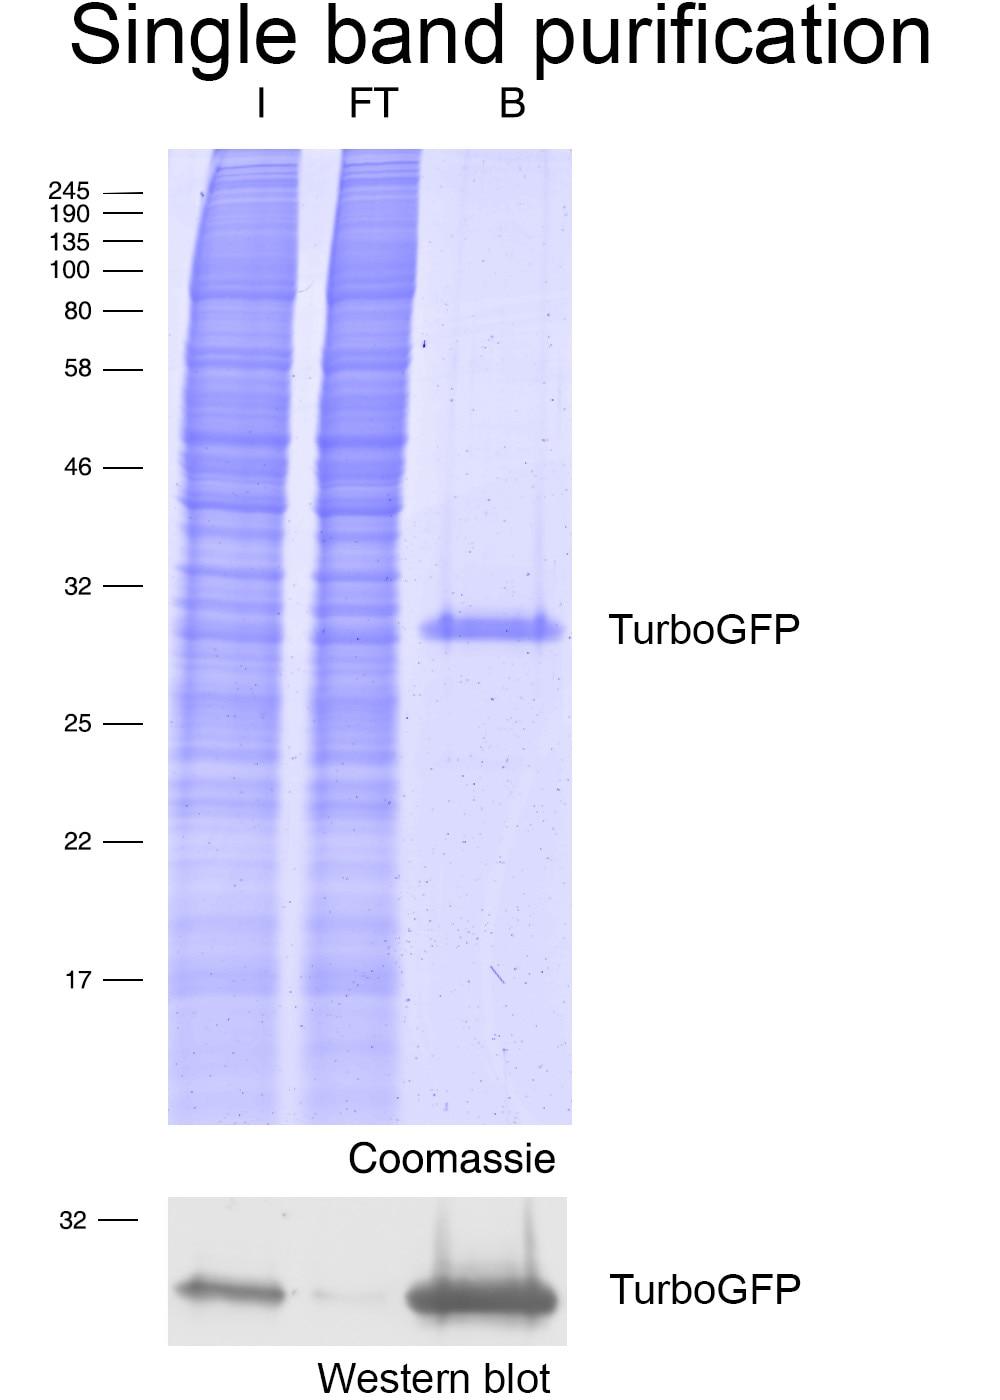 Immunoprecipitation of TurboGFP with Turbo-GFP-Trap